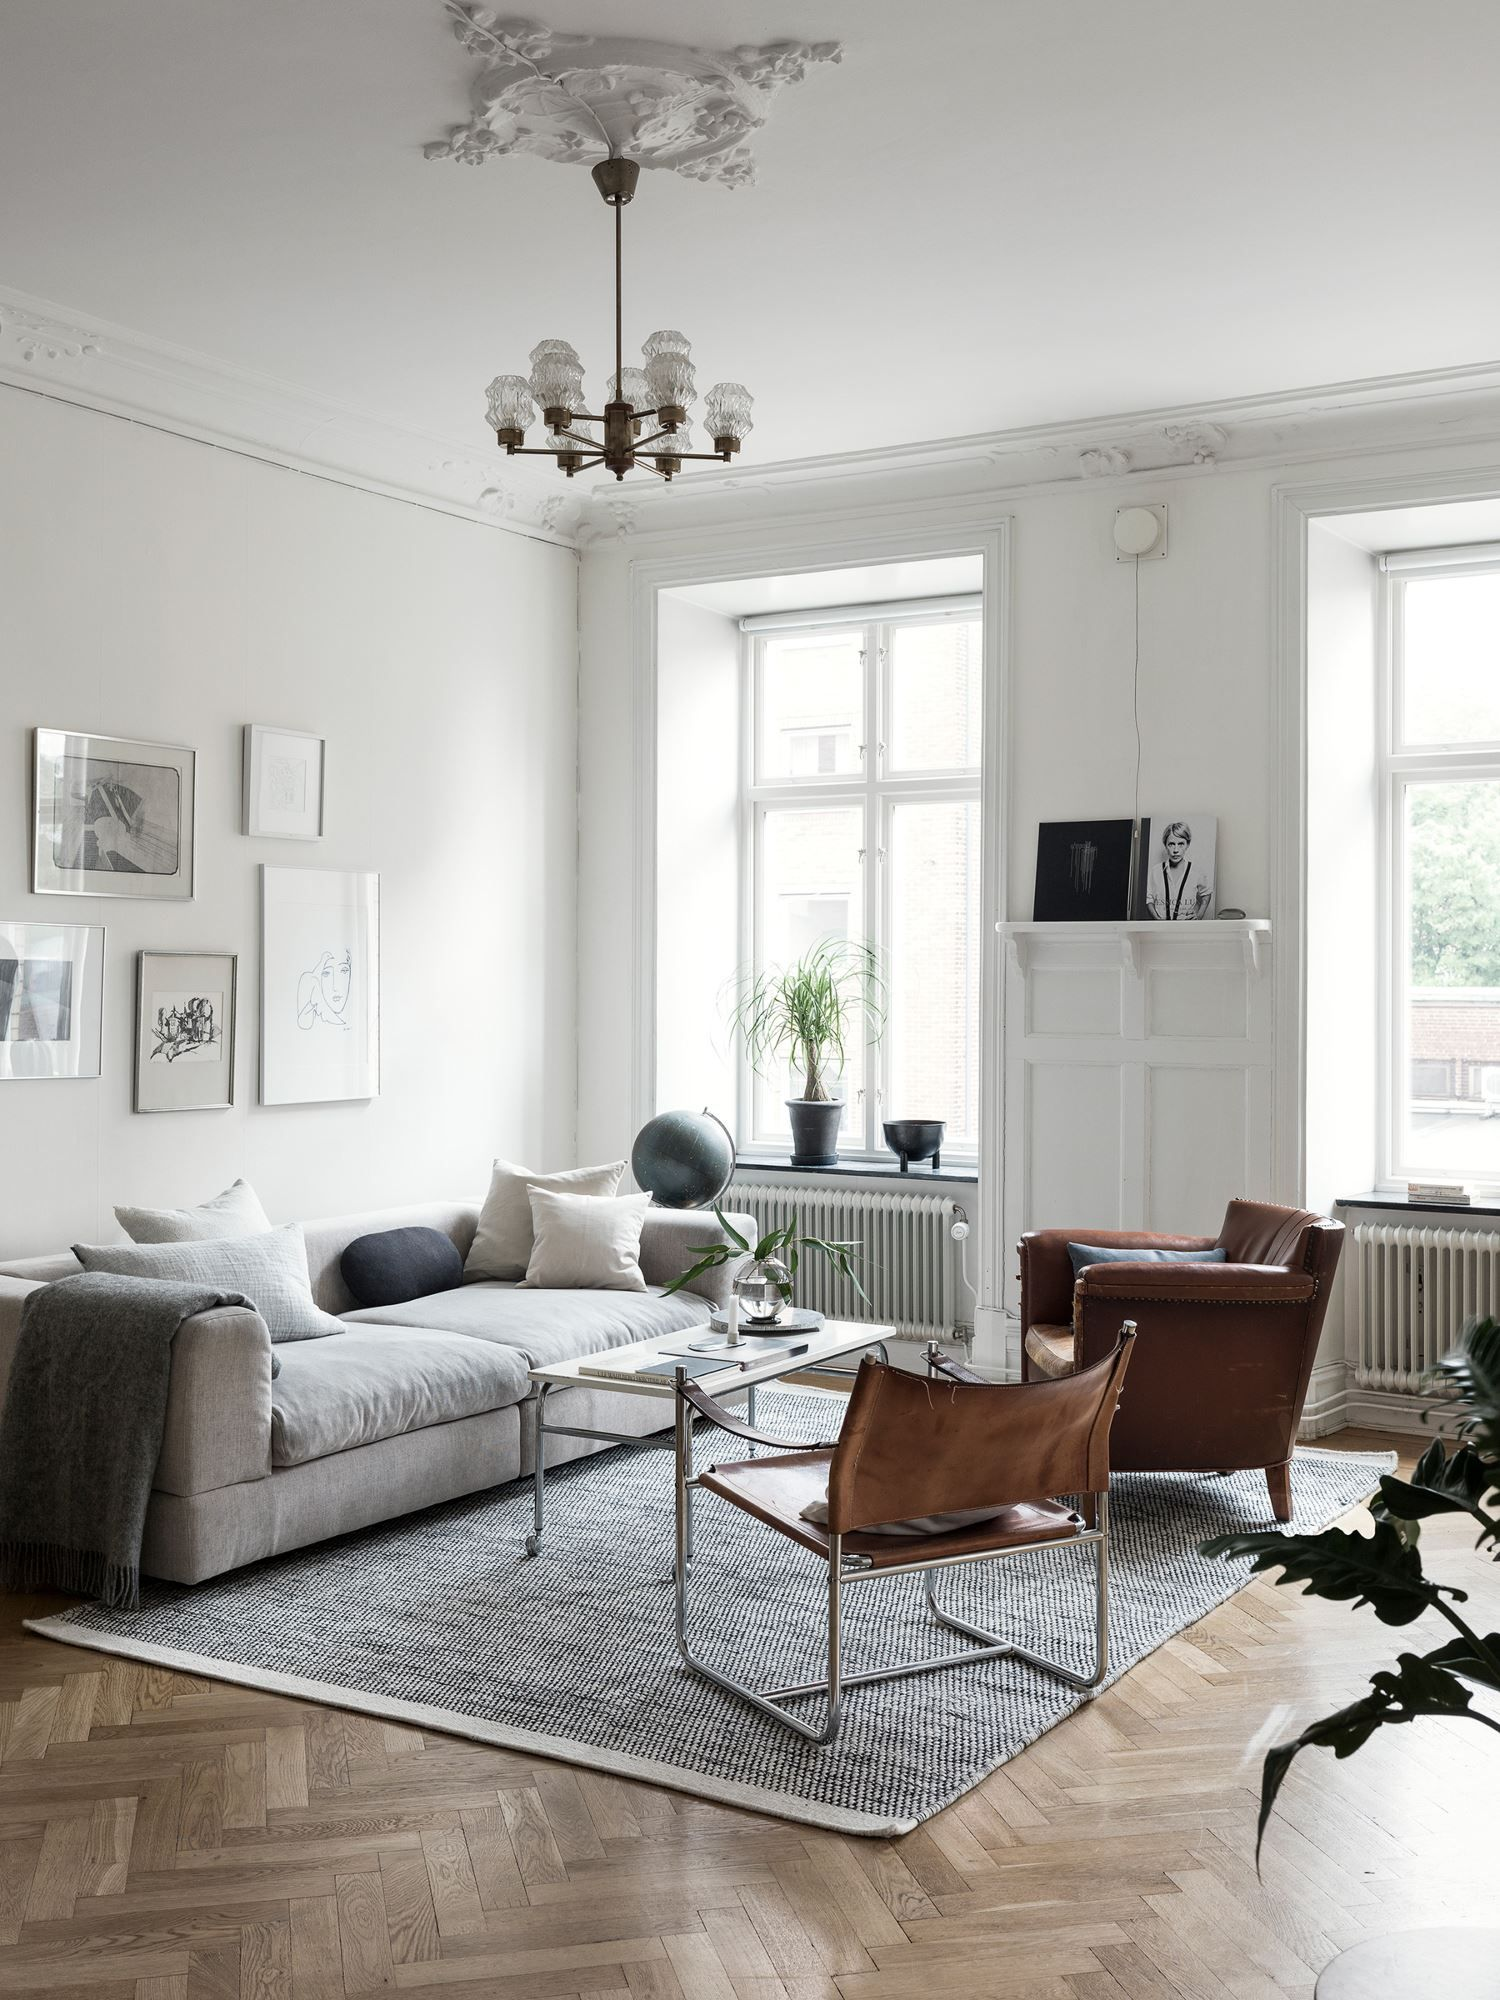 2 rum och k k p timmermansgatan 8 l genhet kvarteret m kleri i g teborg scandinavian. Black Bedroom Furniture Sets. Home Design Ideas